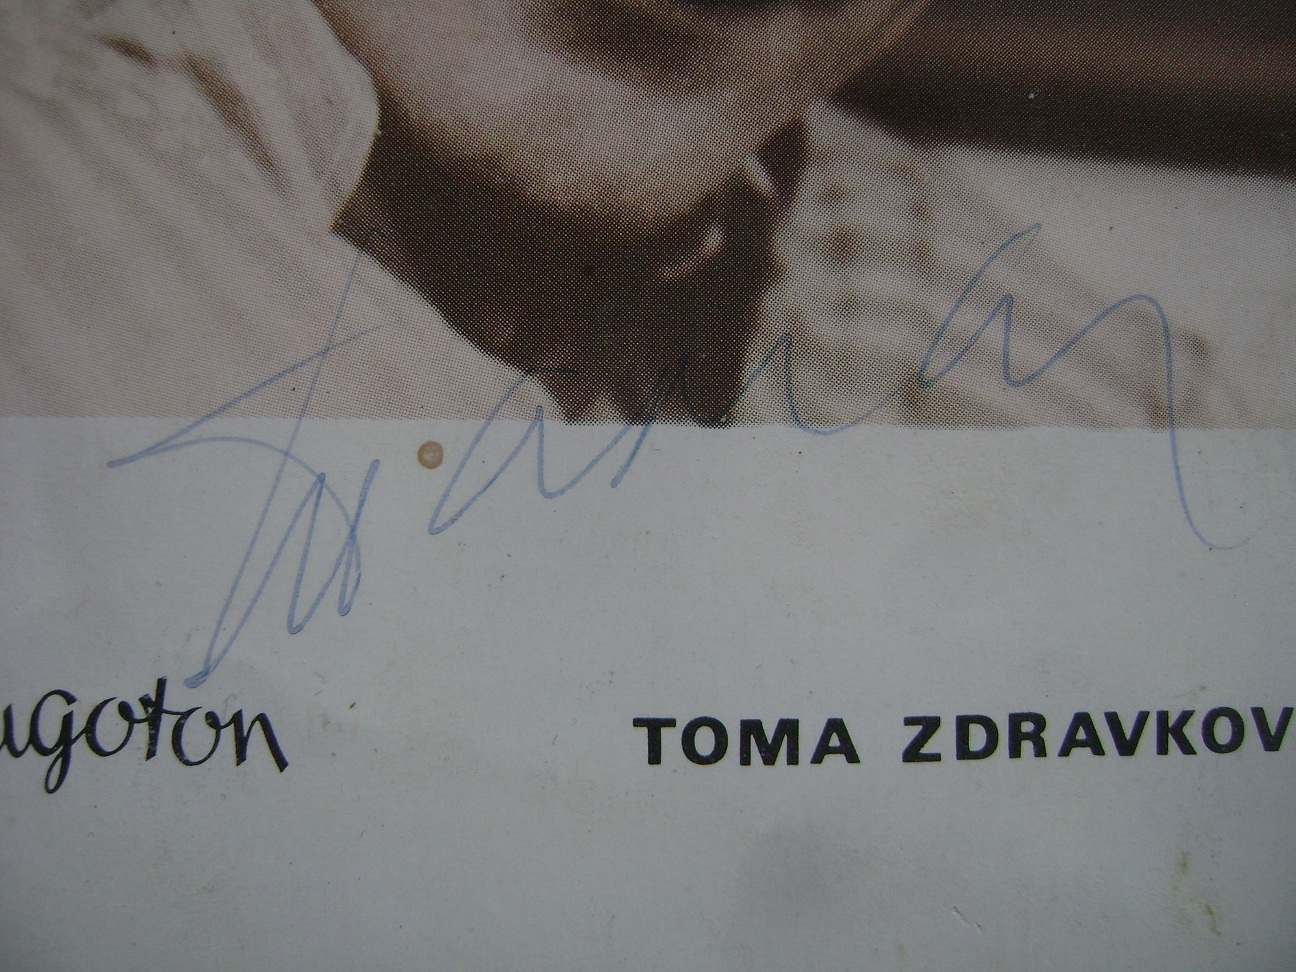 Autogram_Toma_Zdravkovic_1.JPG